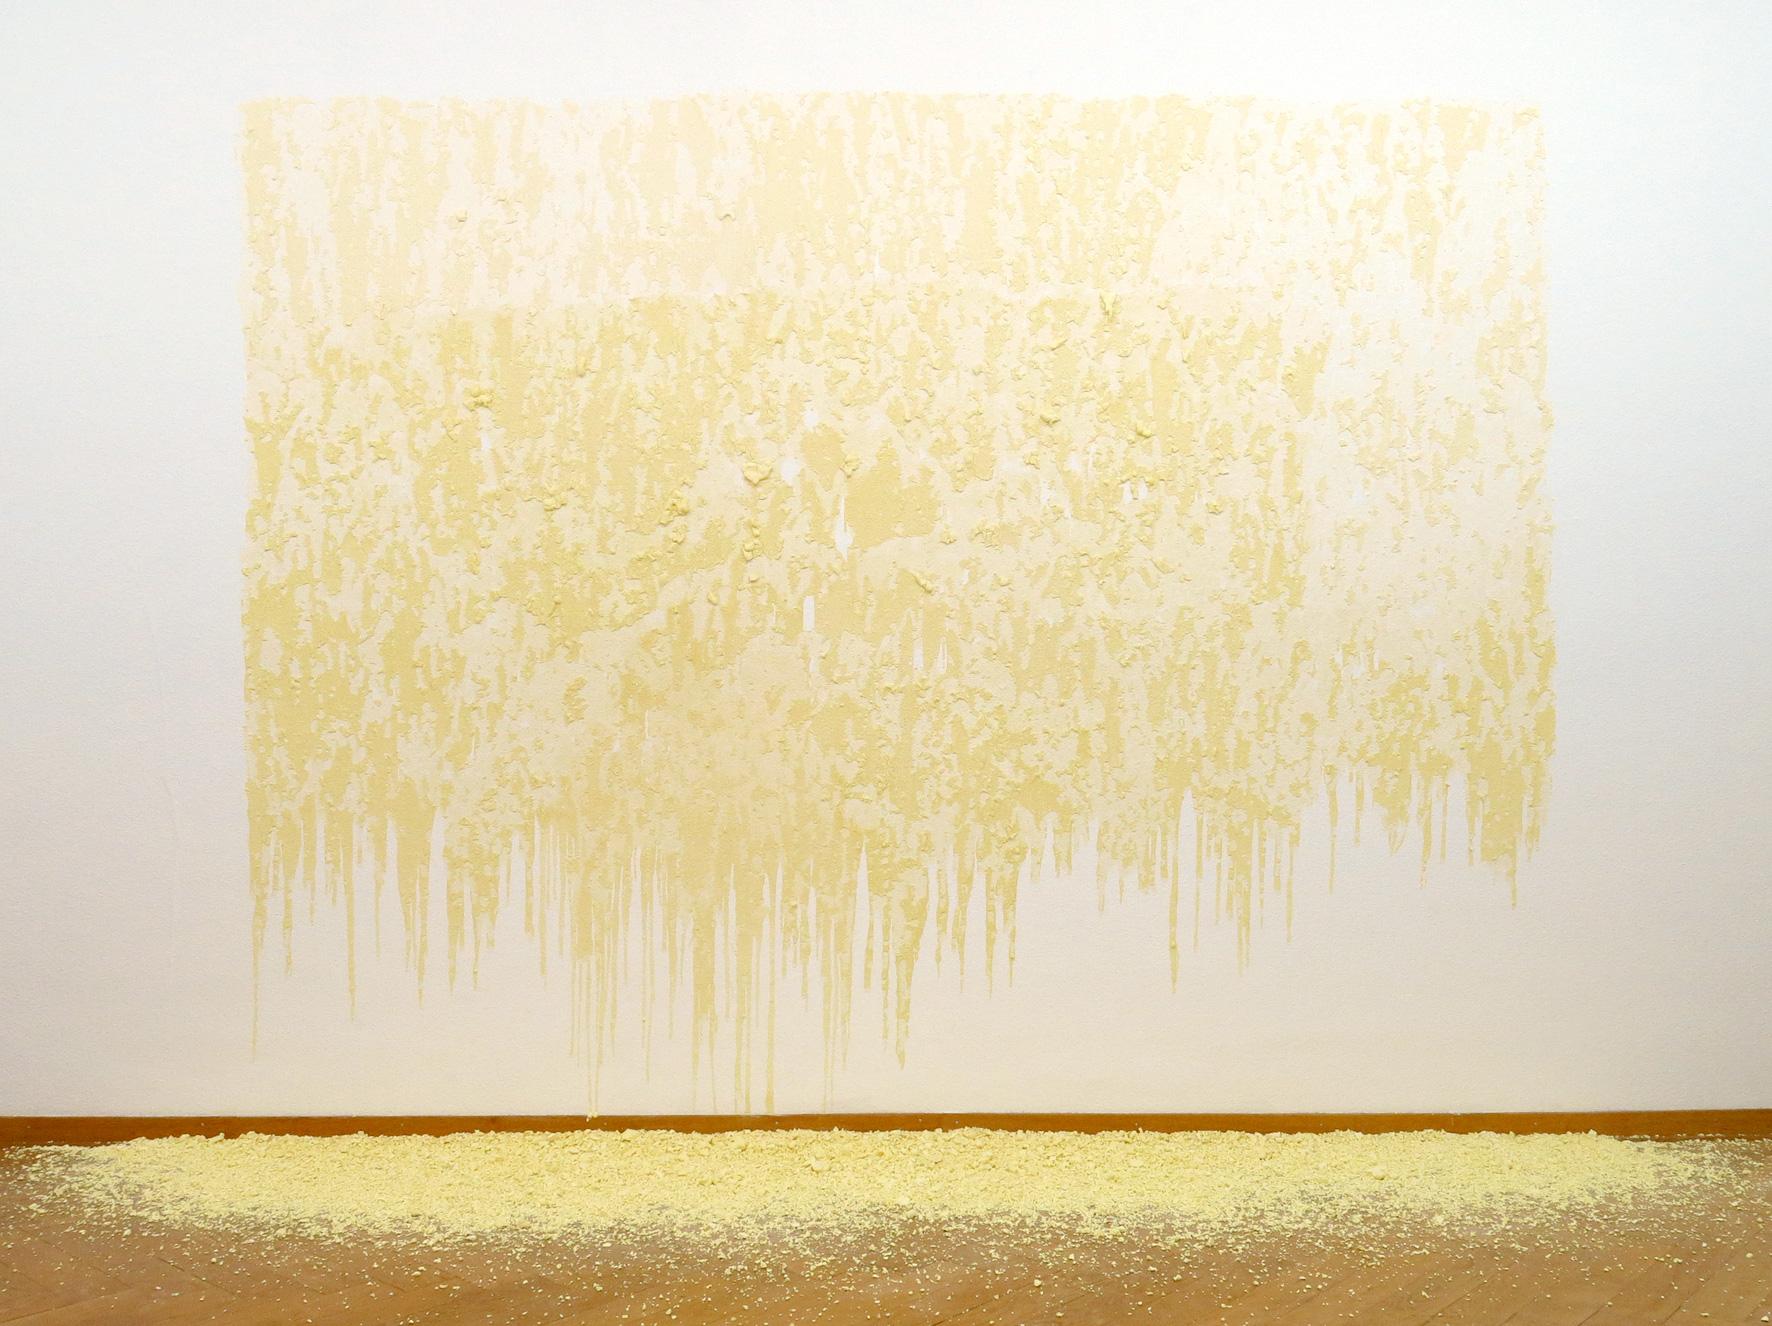 Franziska Baumgartner, Kunst, Installation auf Wand mit Maizena und Kurkuma